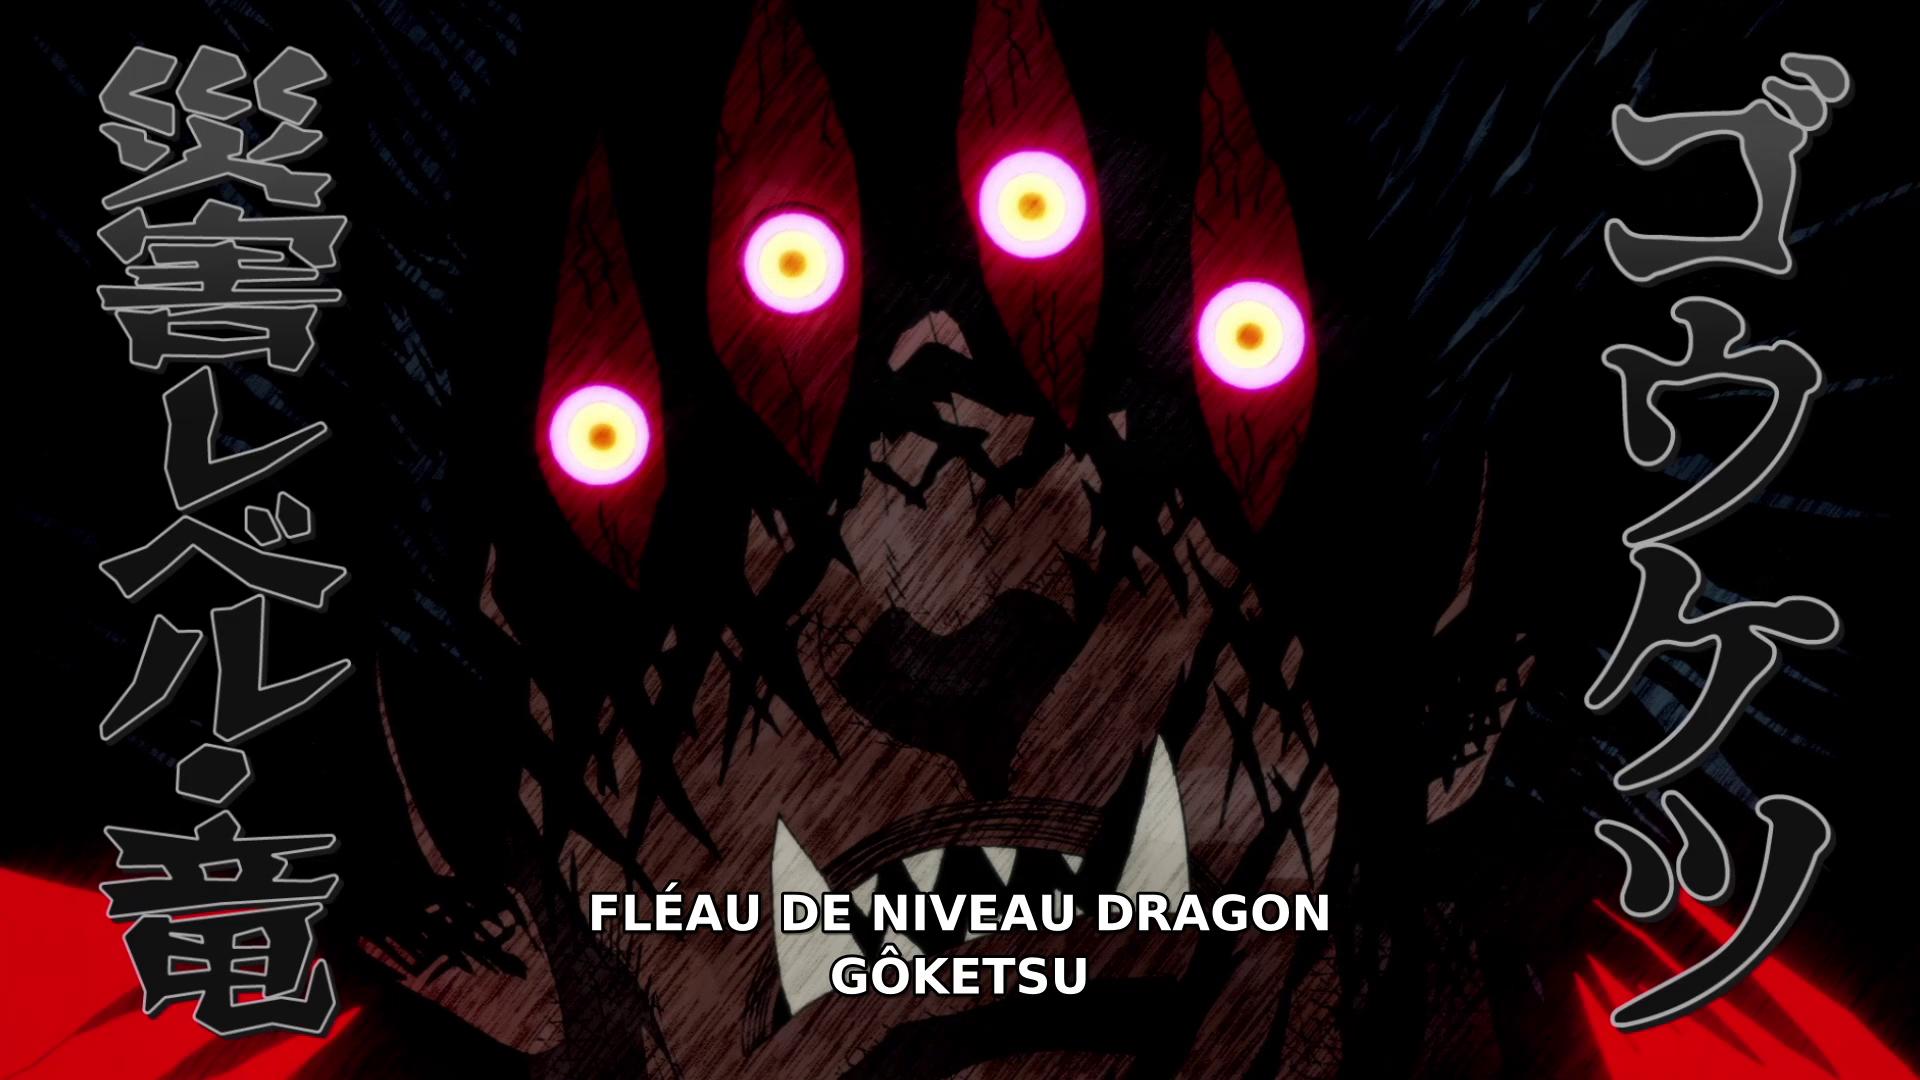 One Punch Man Saison 2 épisode 8 Vostfr One Punch Anime One Punch Man One Punch Man